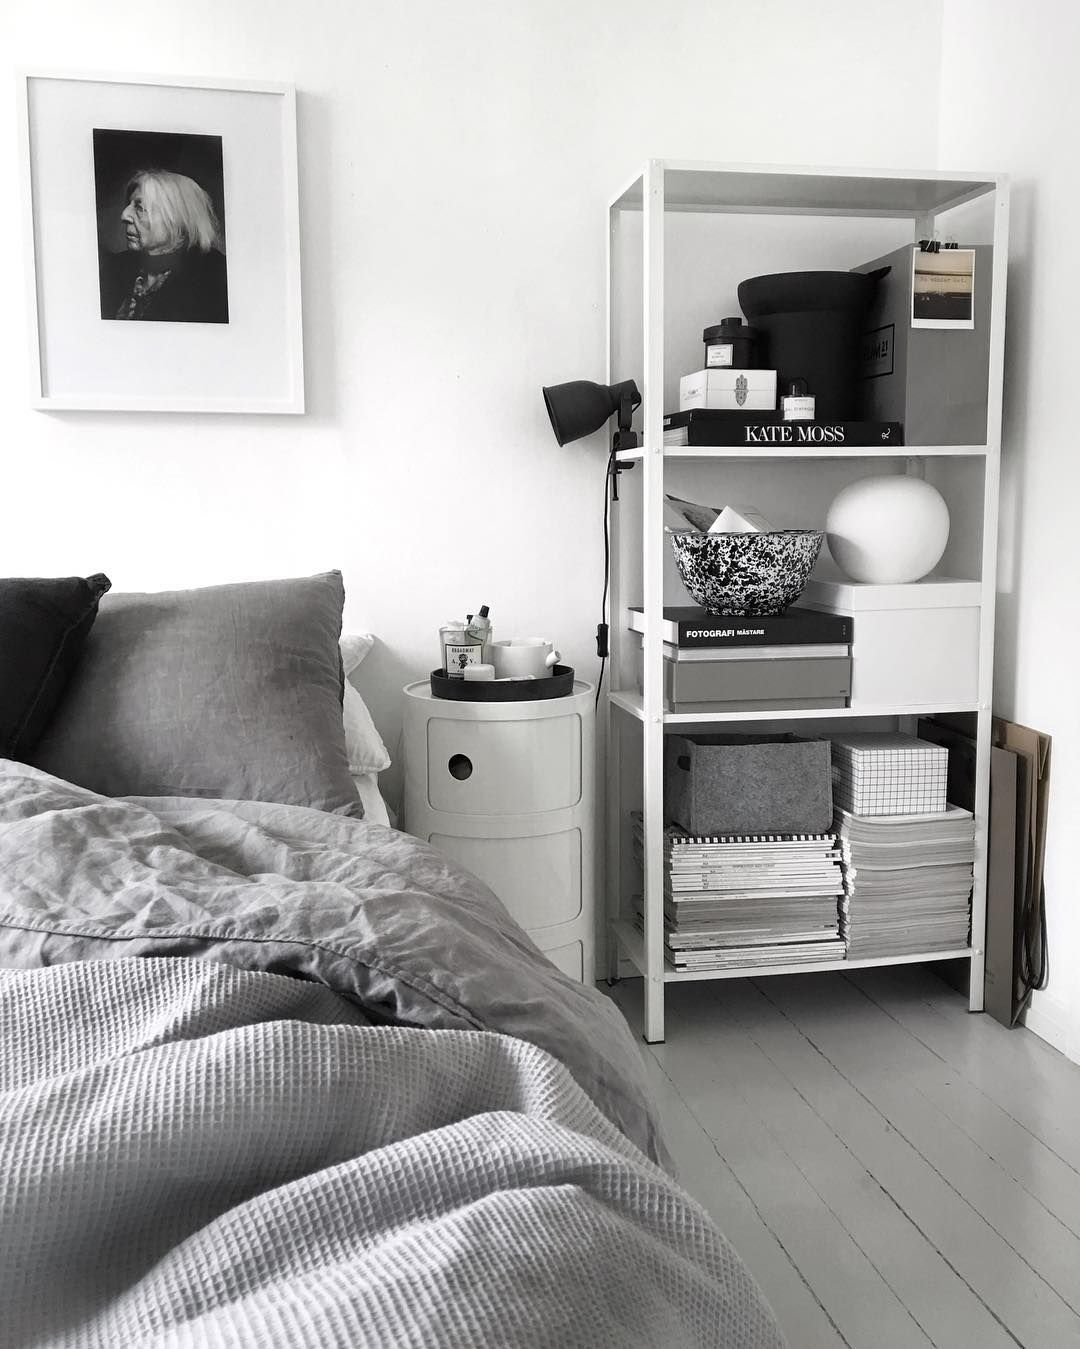 Bedroom Art Ikea: Ikea 'Hyllis' Metallic Shelf In Bedroom By @49kvadrat